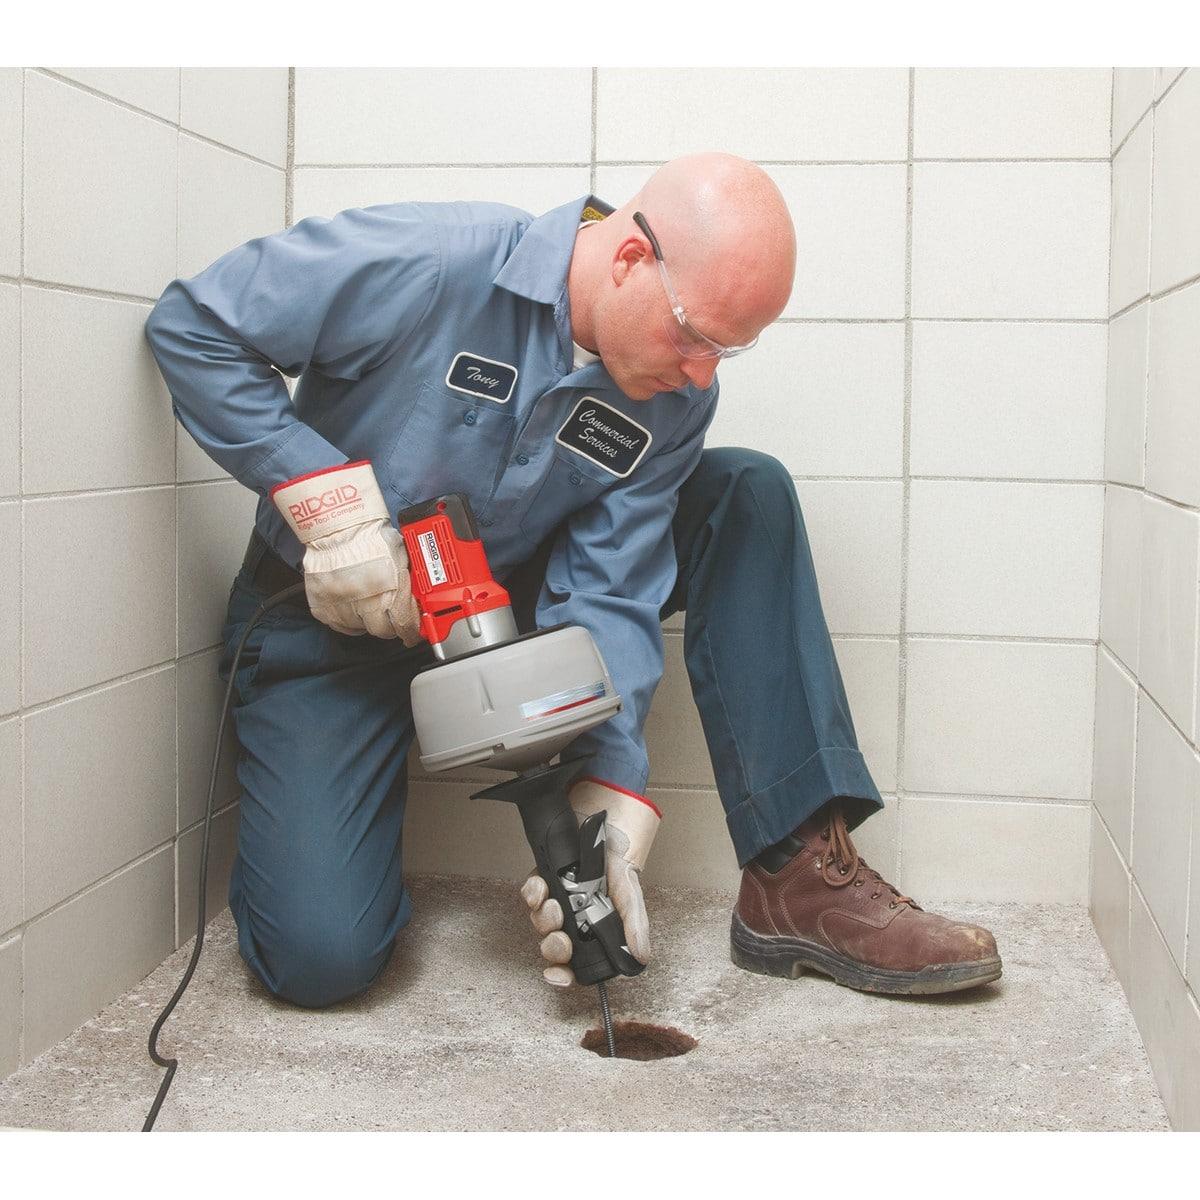 deboucheur debouchage canalisation depannage curage vidange 119 150x150 - débouchage canalisation WC Uccle   service express